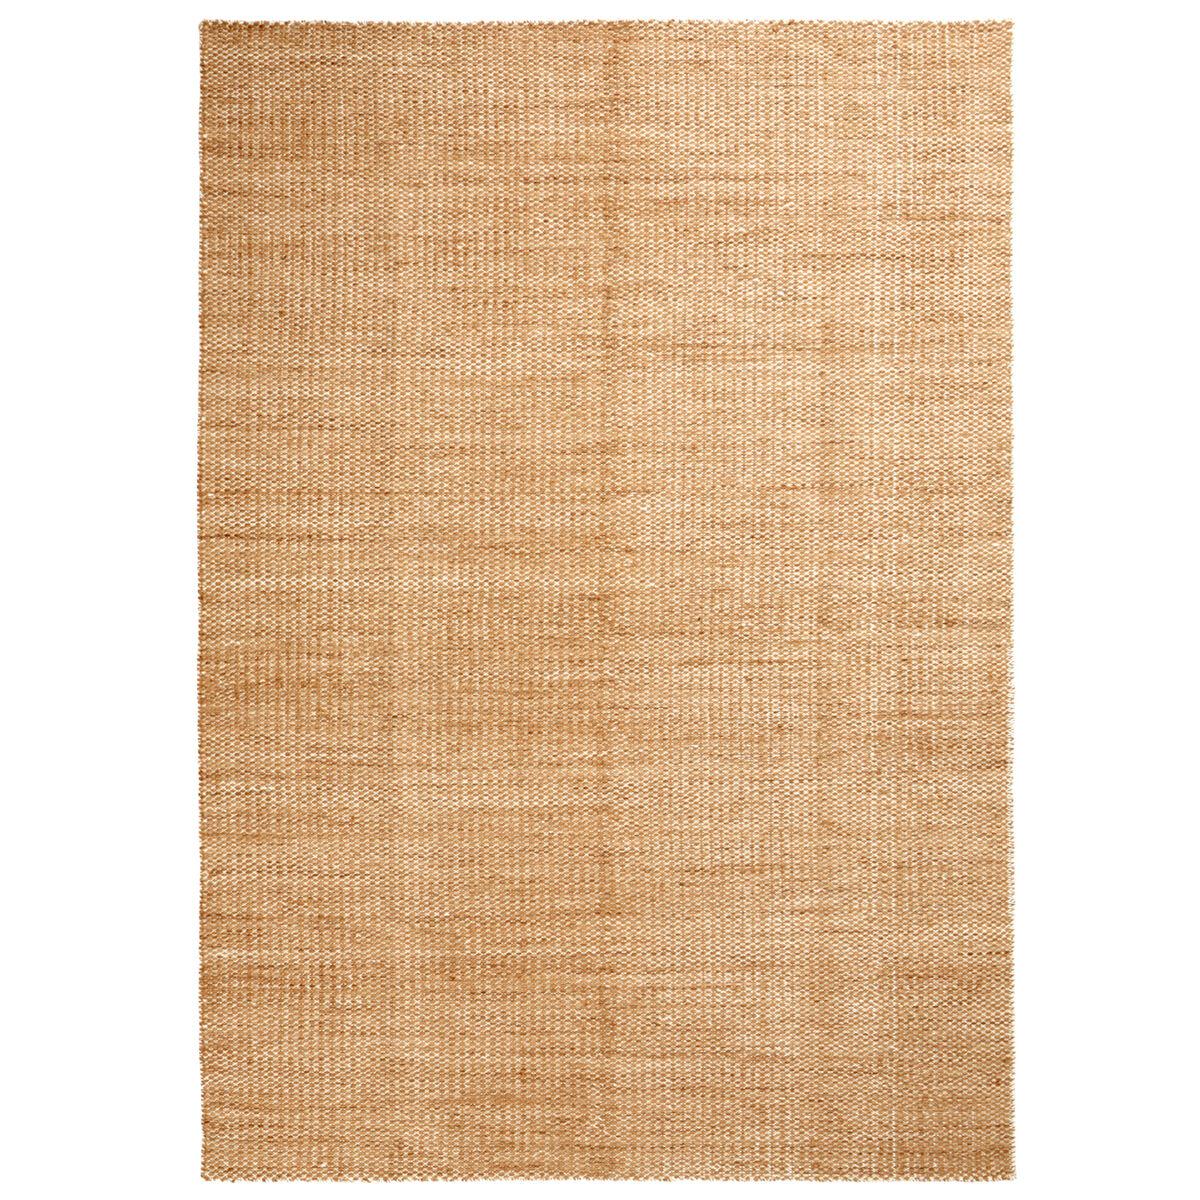 Image of Hay Moiré Kelim matto, 140 x 200 cm, keltainen